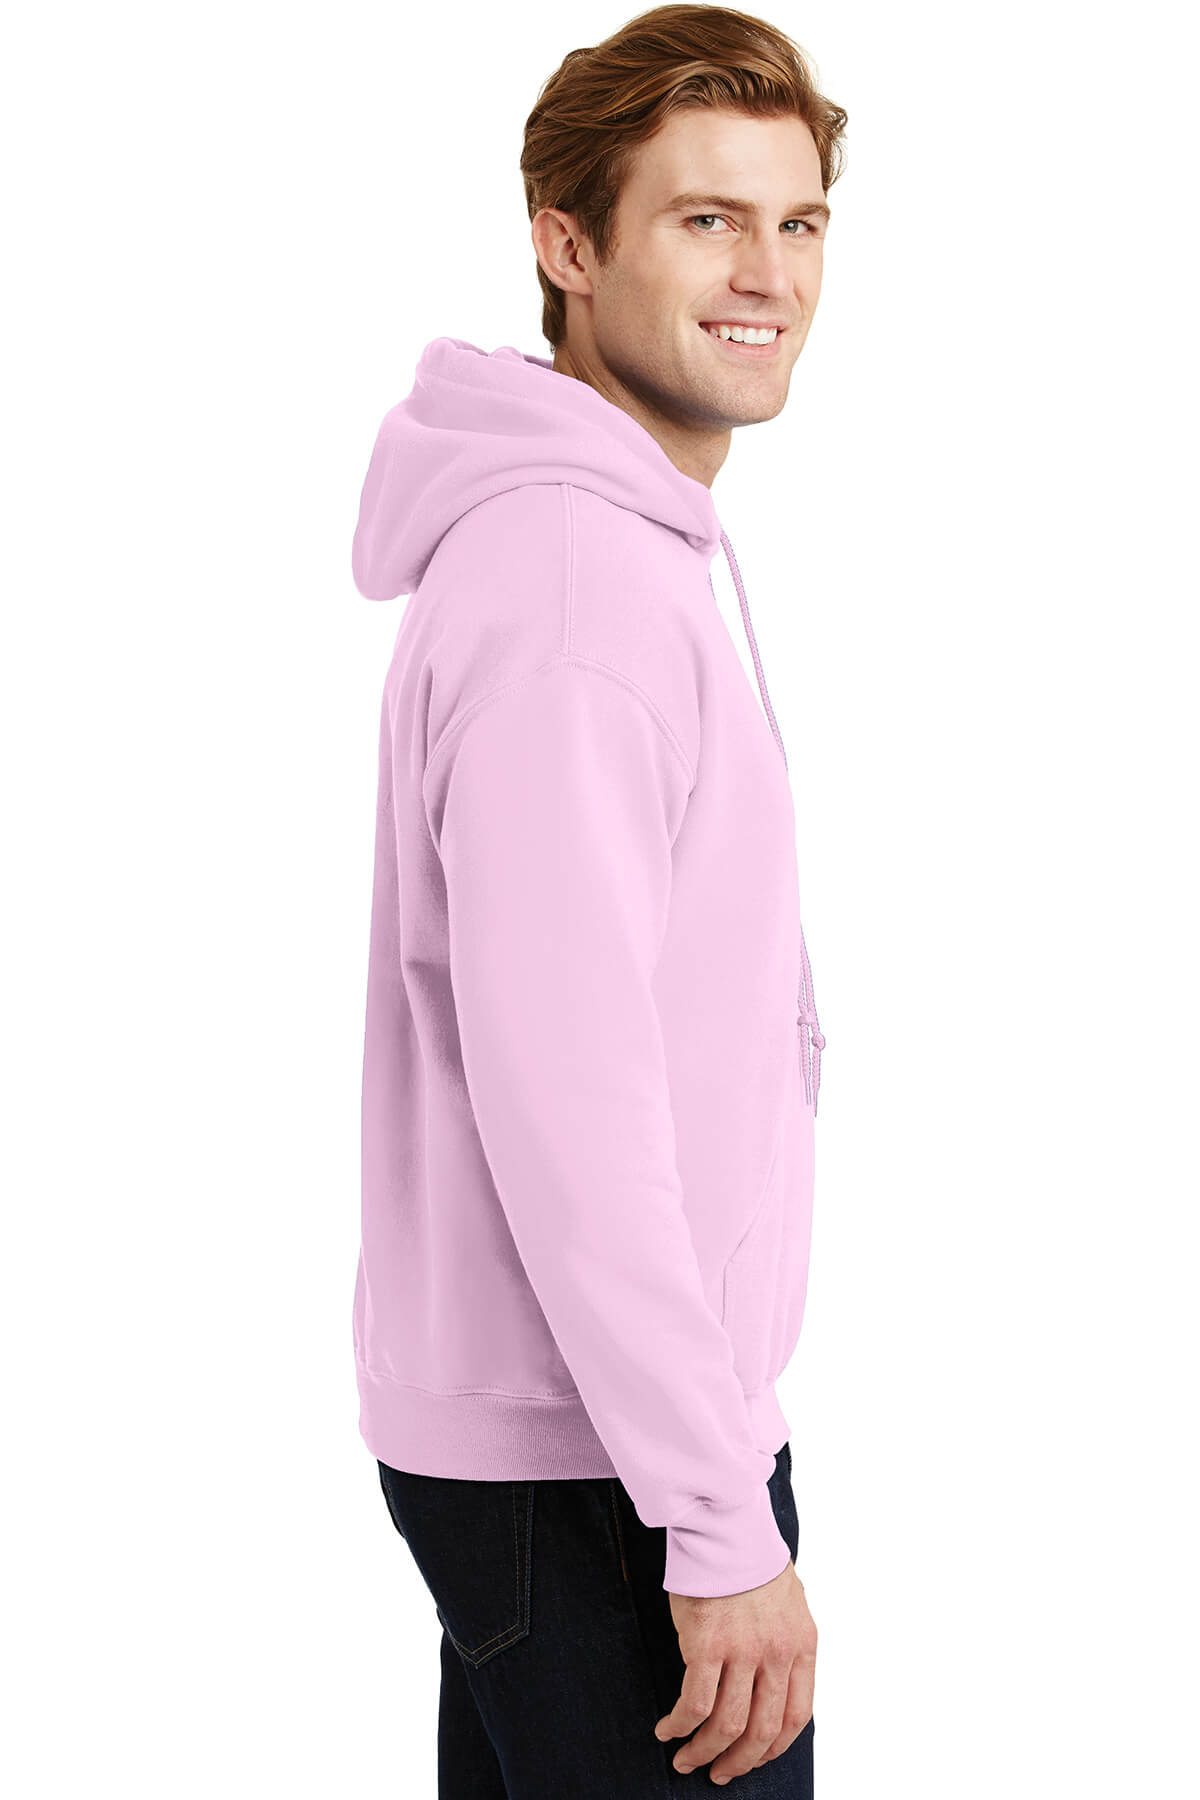 18500-light-pink-2